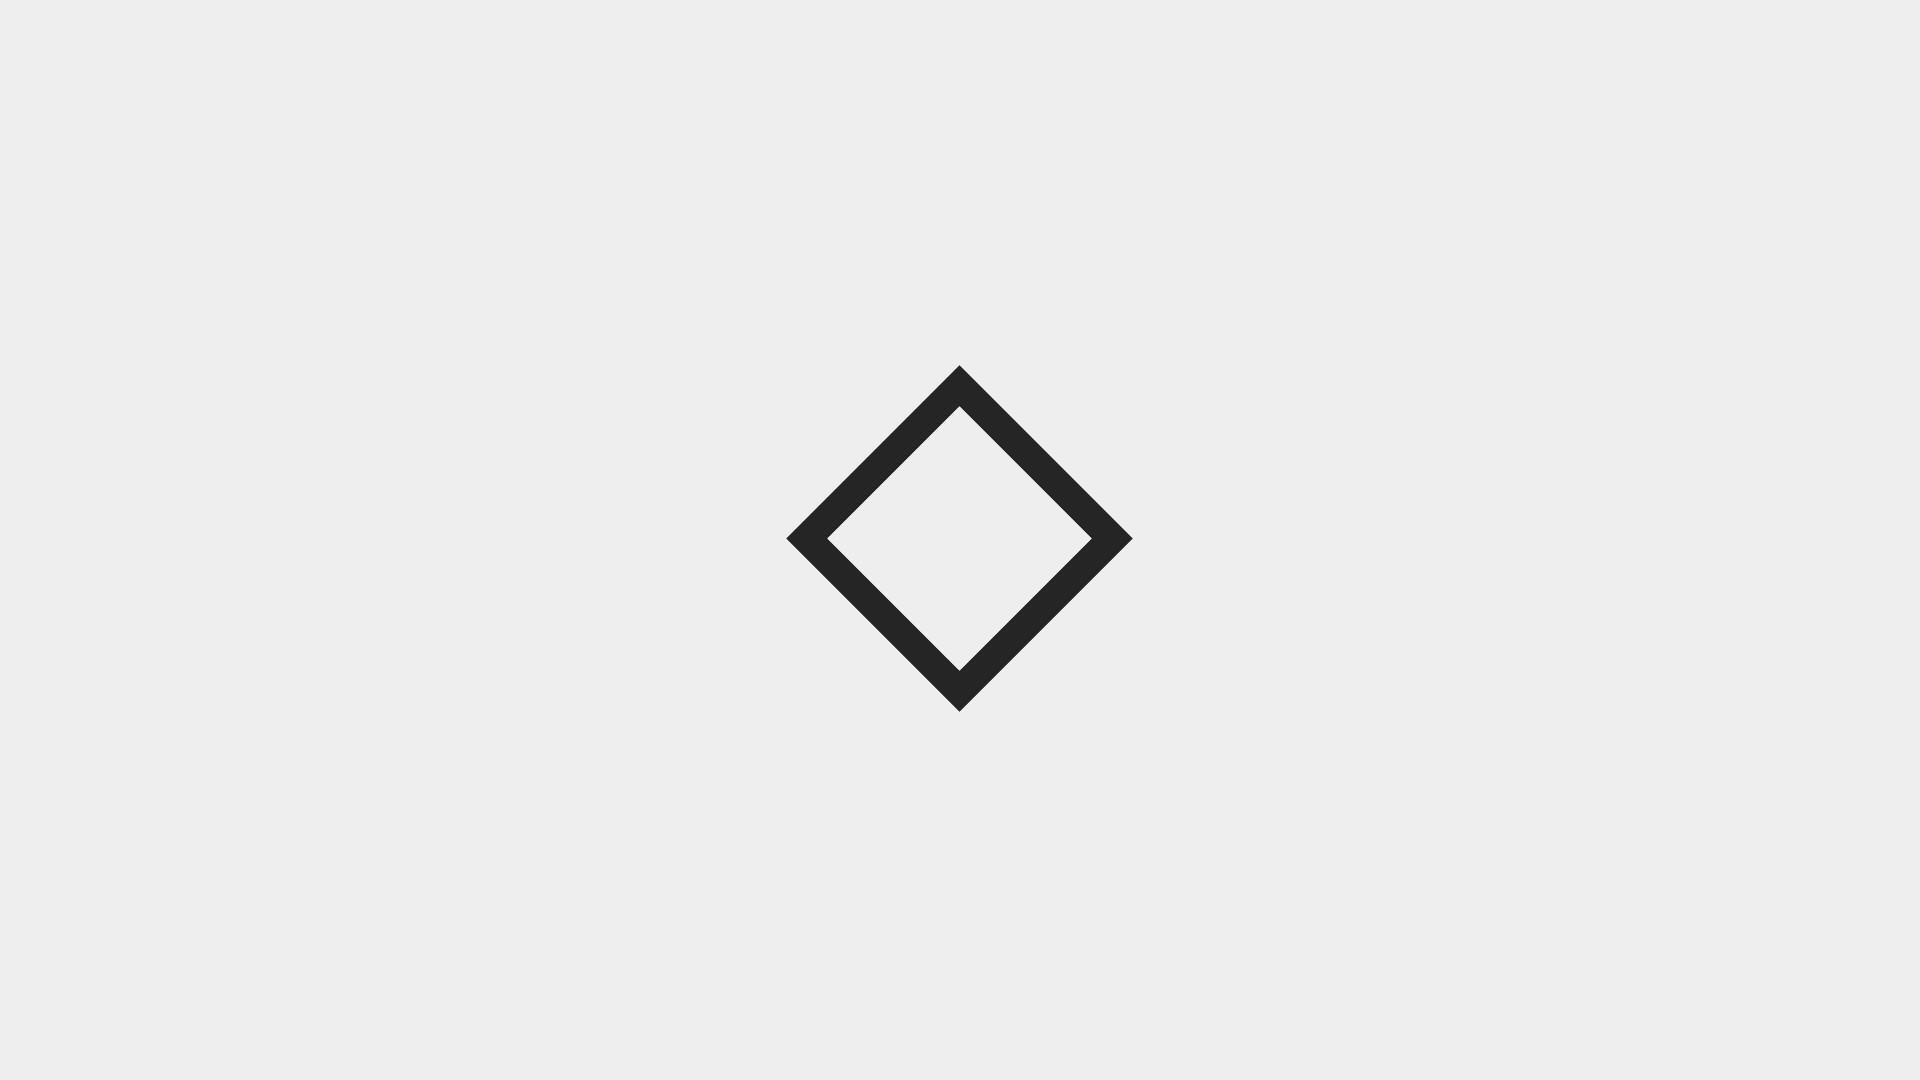 Wallpaper : white, abstract, minimalism, artwork, logo ...